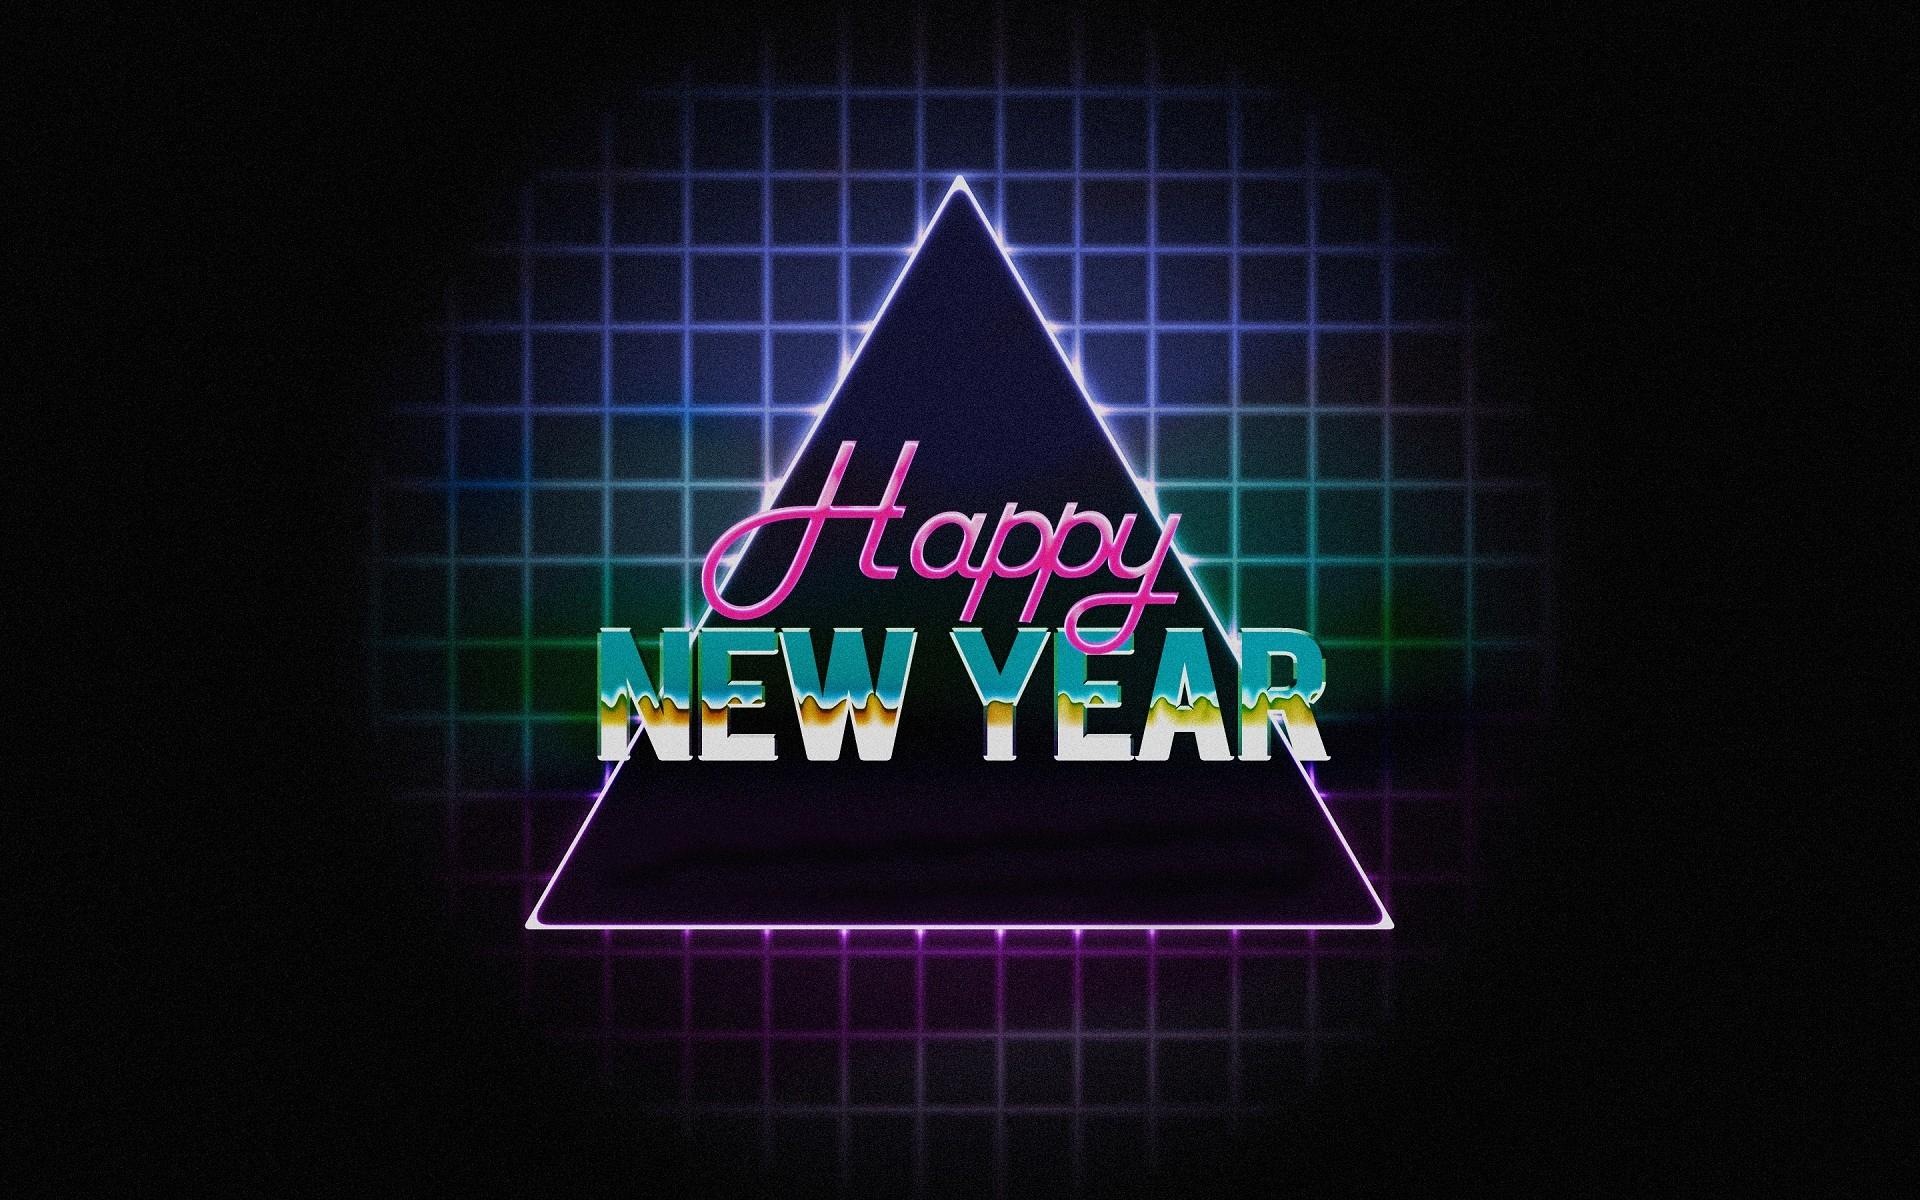 2017 Happy New Year Wallpaper 4